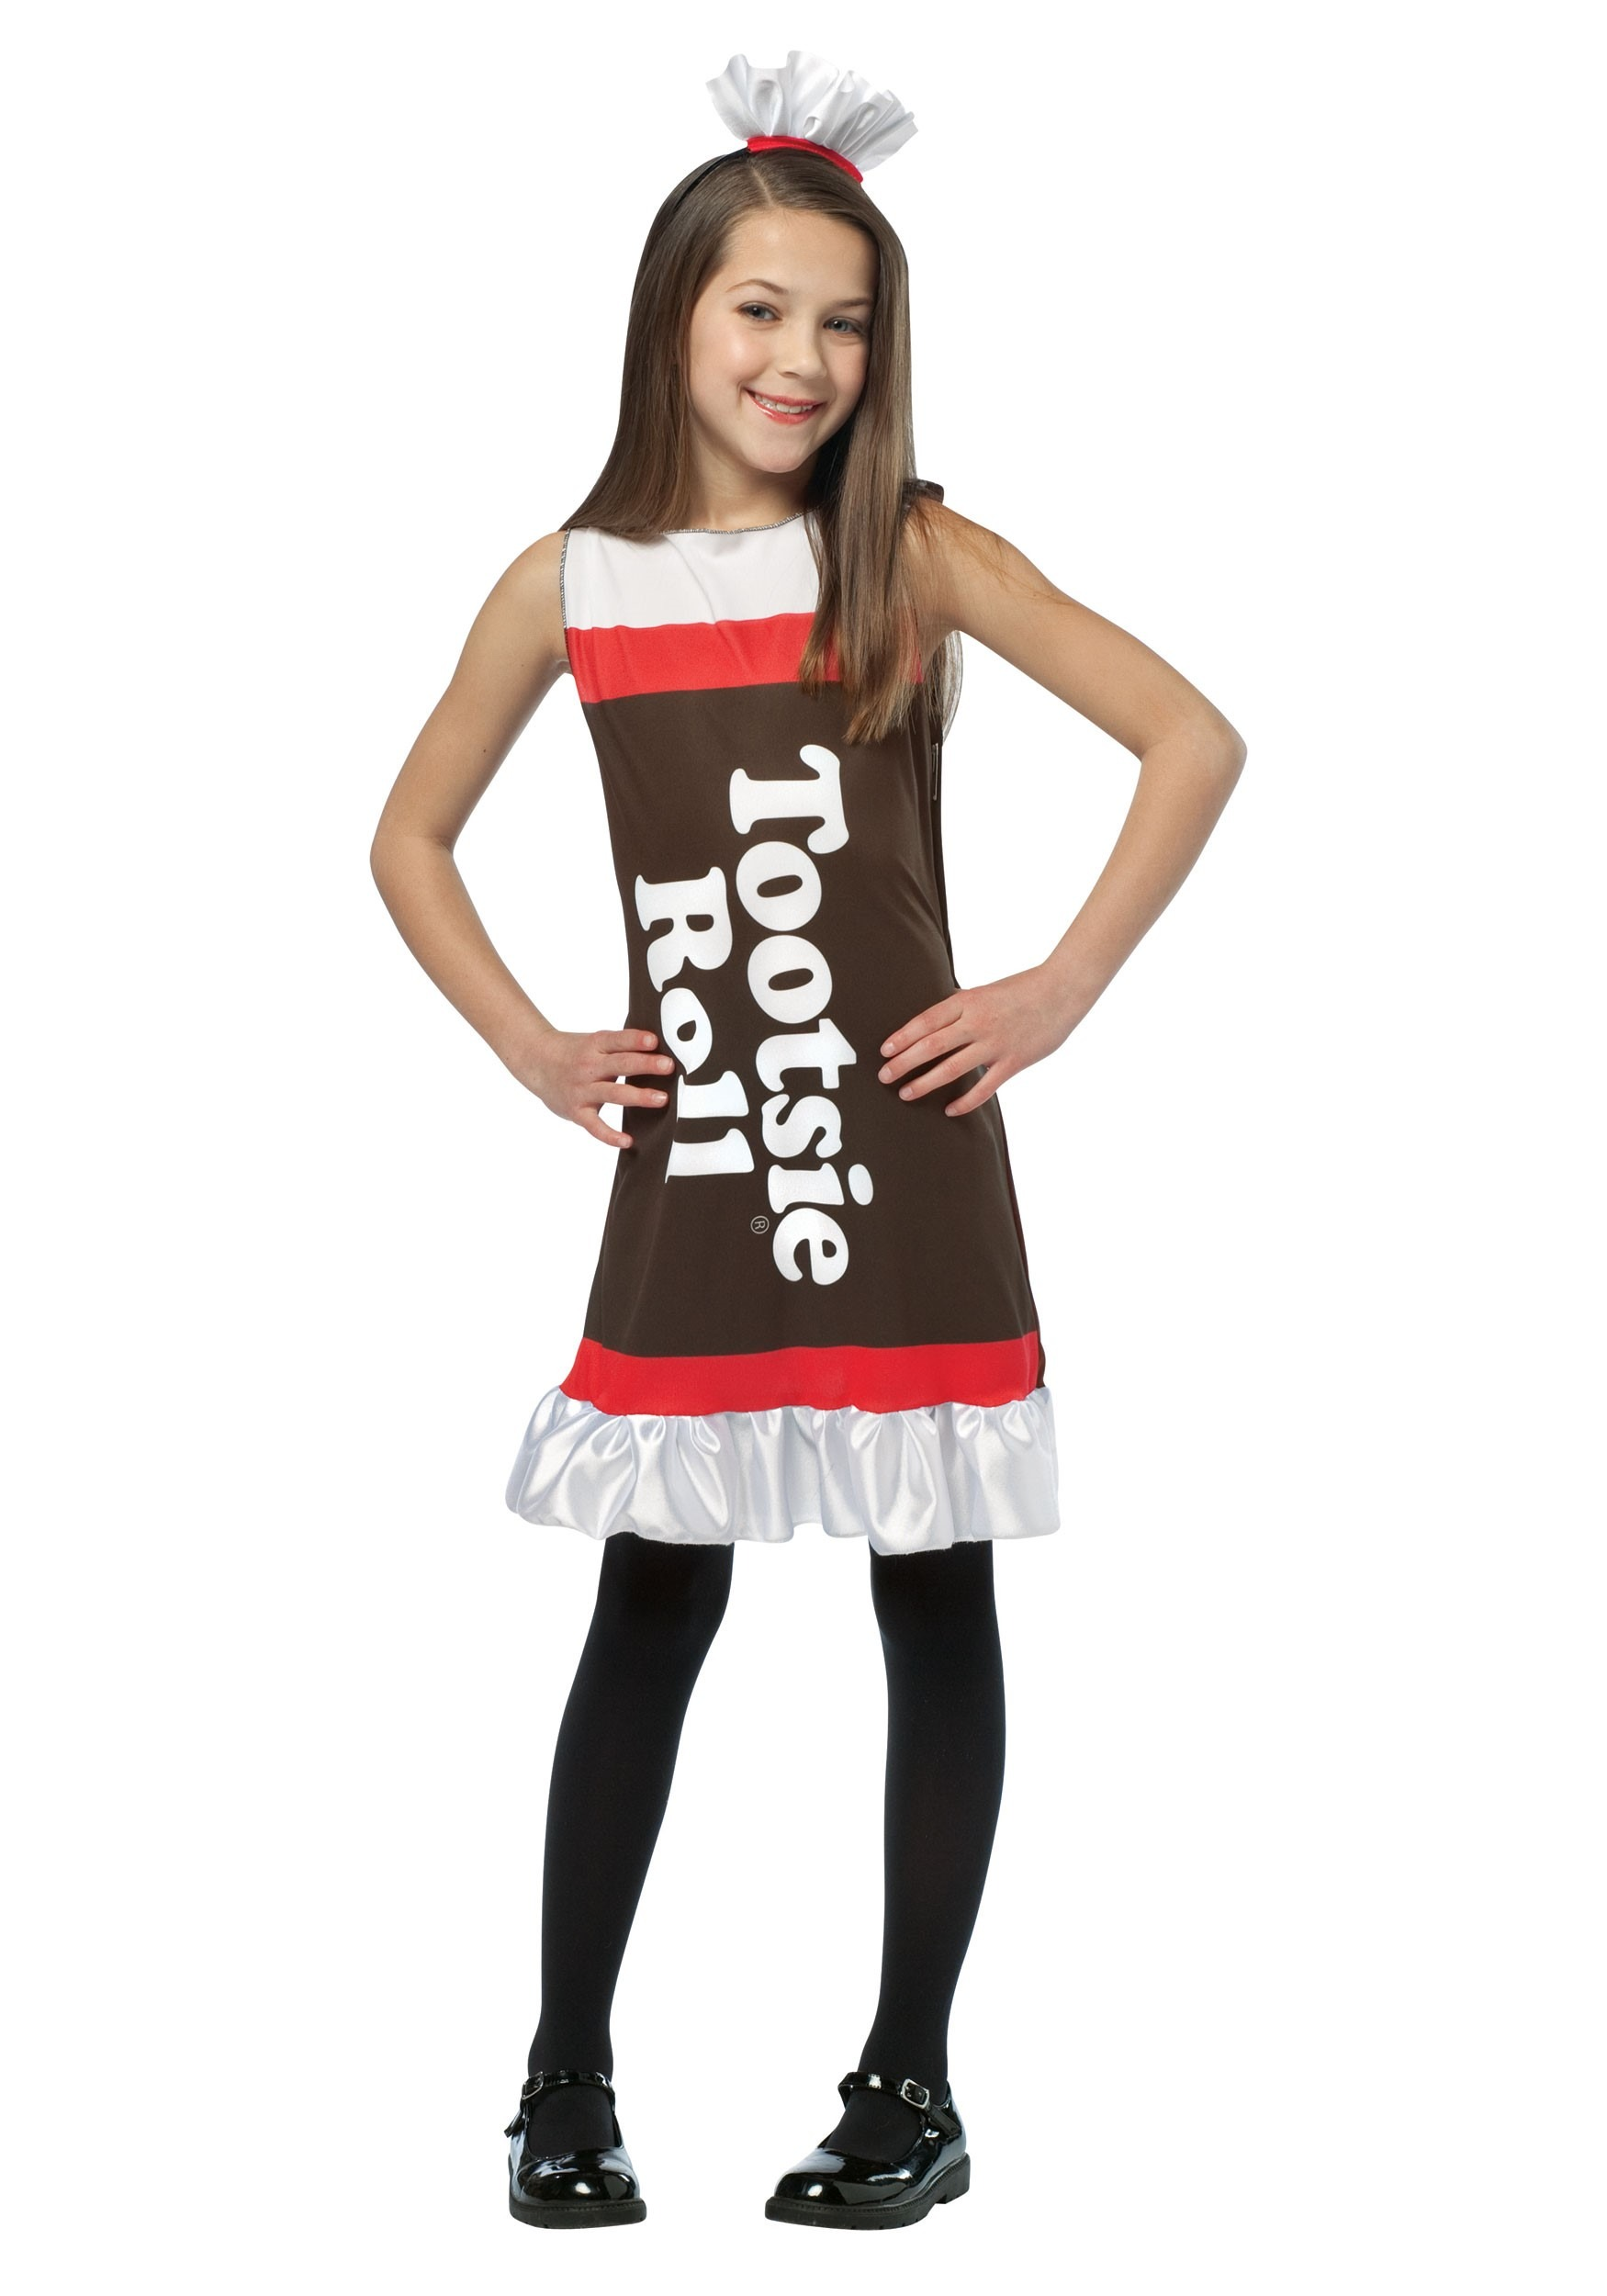 tootsie roll dress for girls